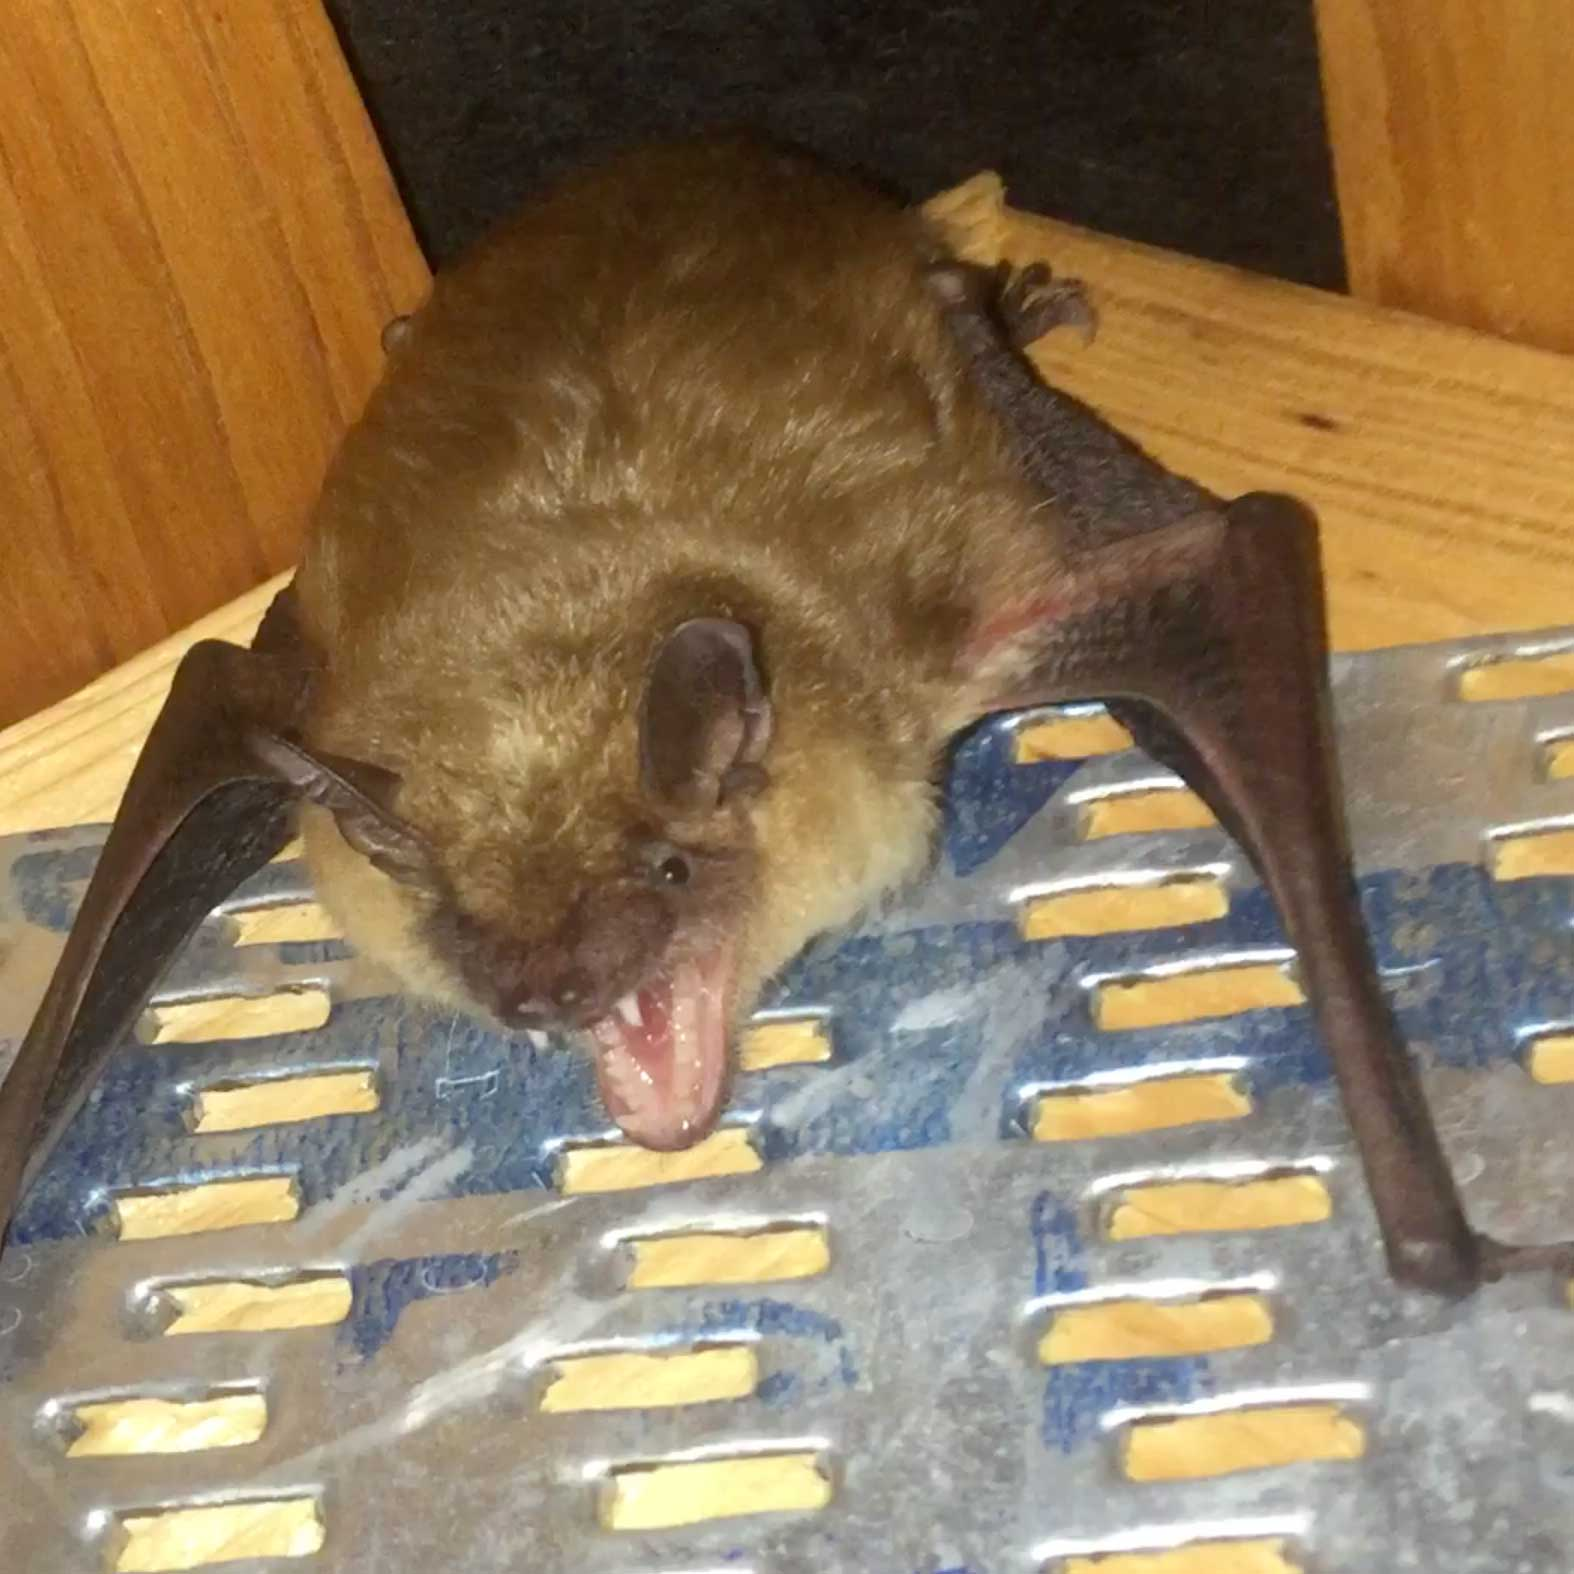 A big brown bat in an attic image